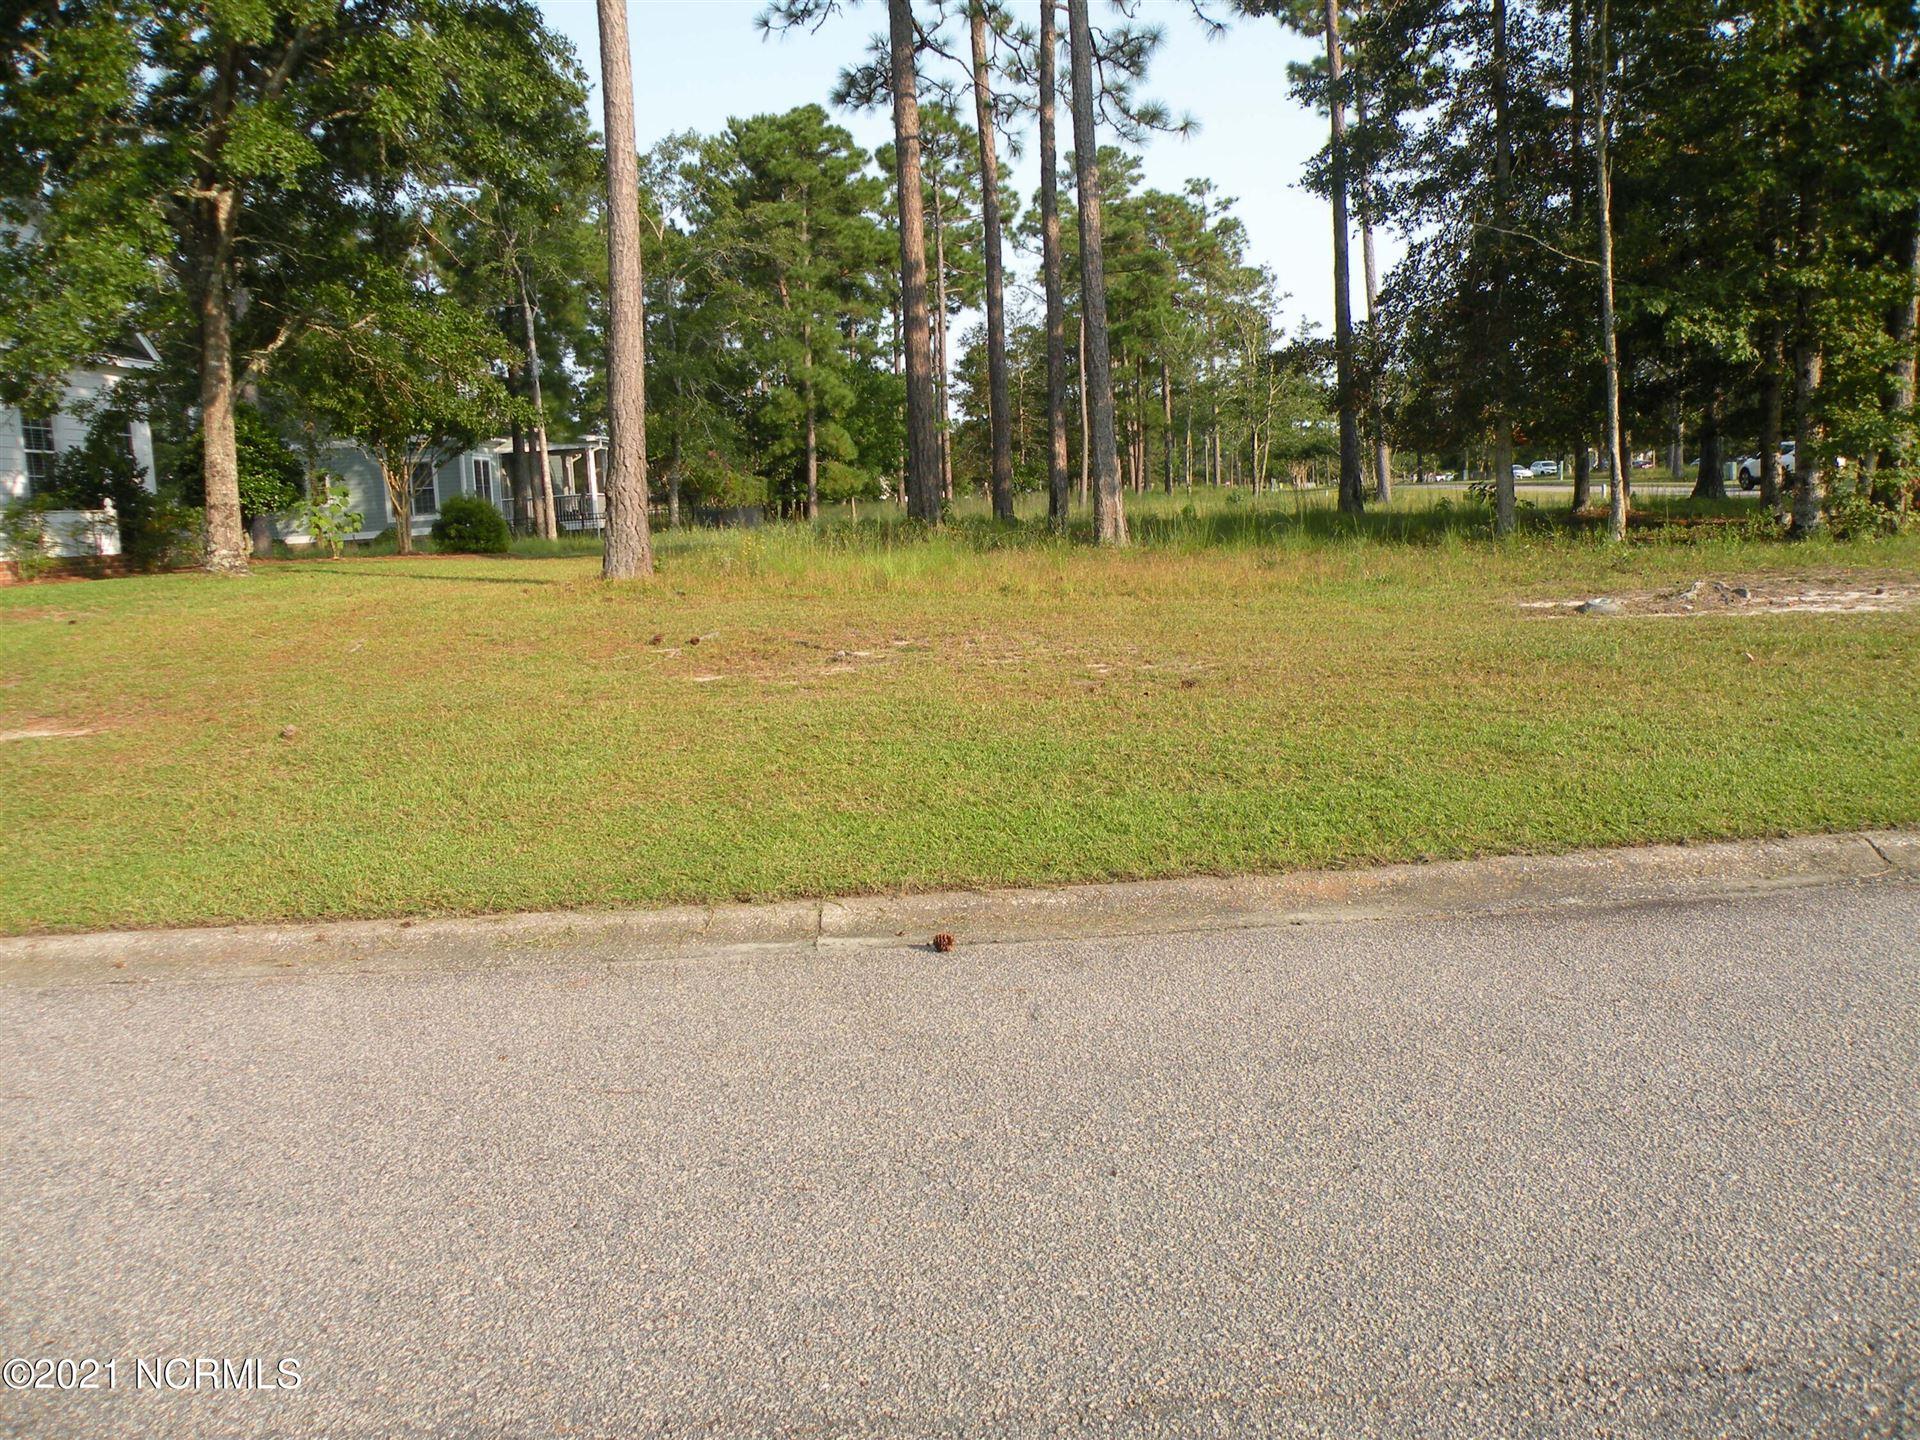 Photo of 354 River Village Square, Shallotte, NC 28470 (MLS # 100292336)